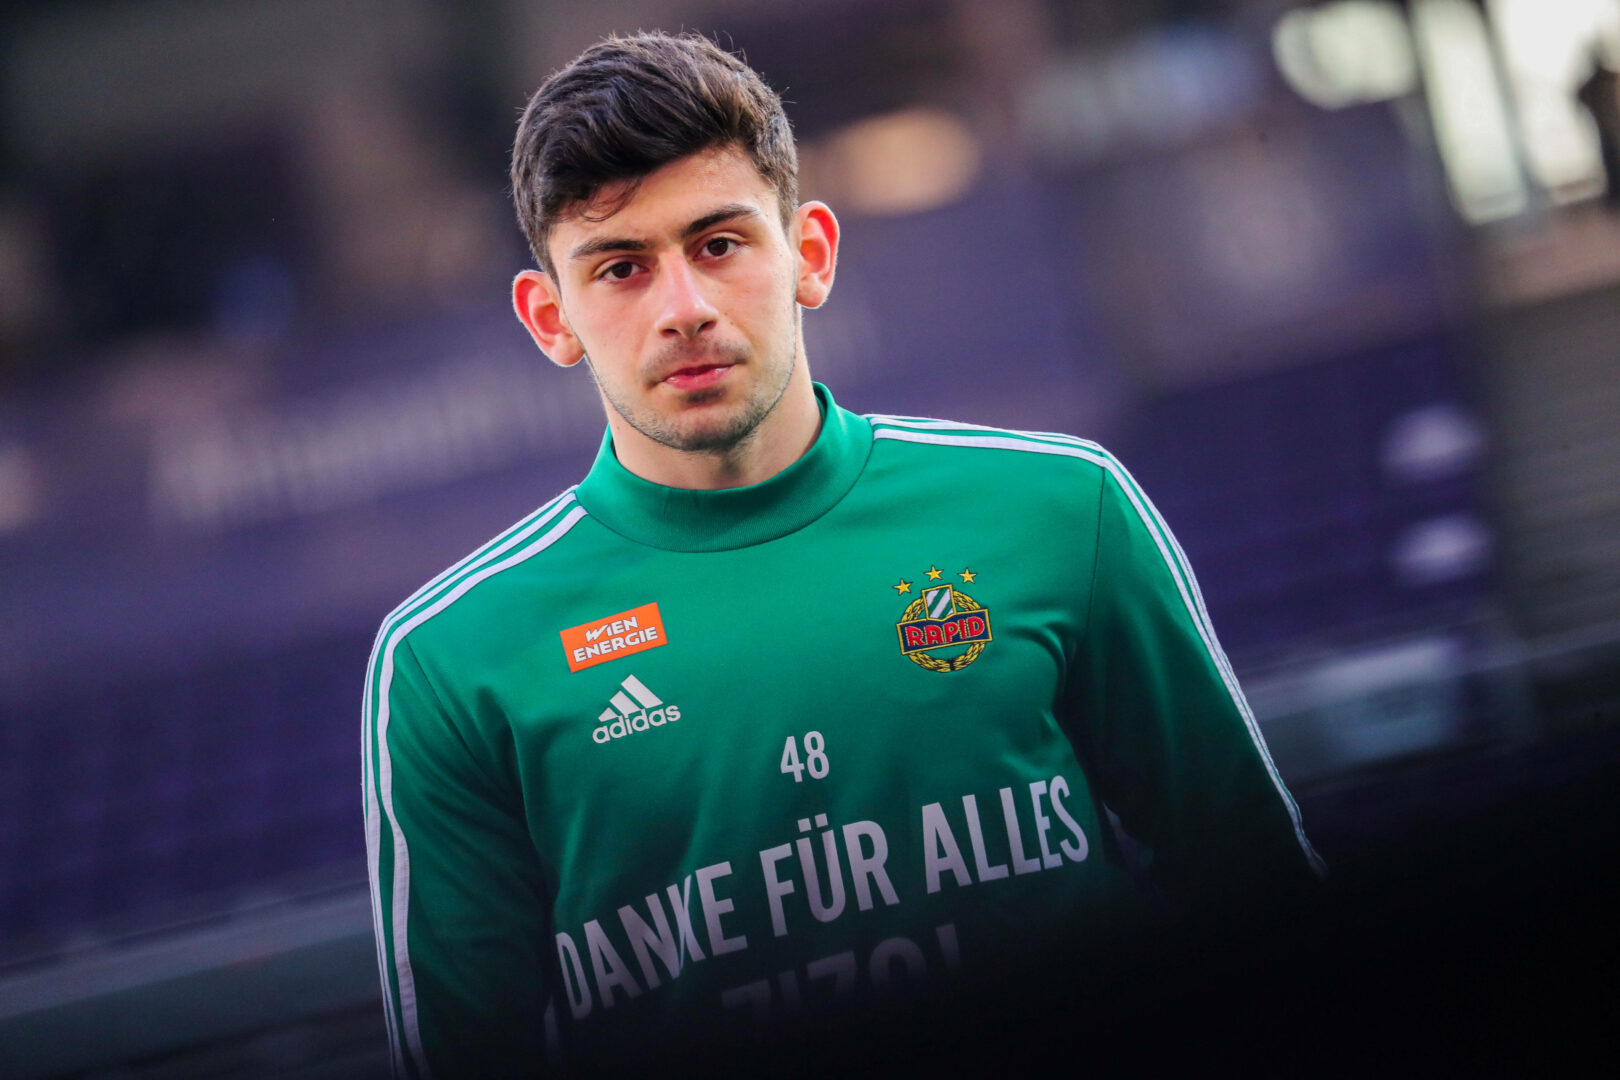 Offiziell: Barca sichert sich Demir – von zig Topklubs umworben!